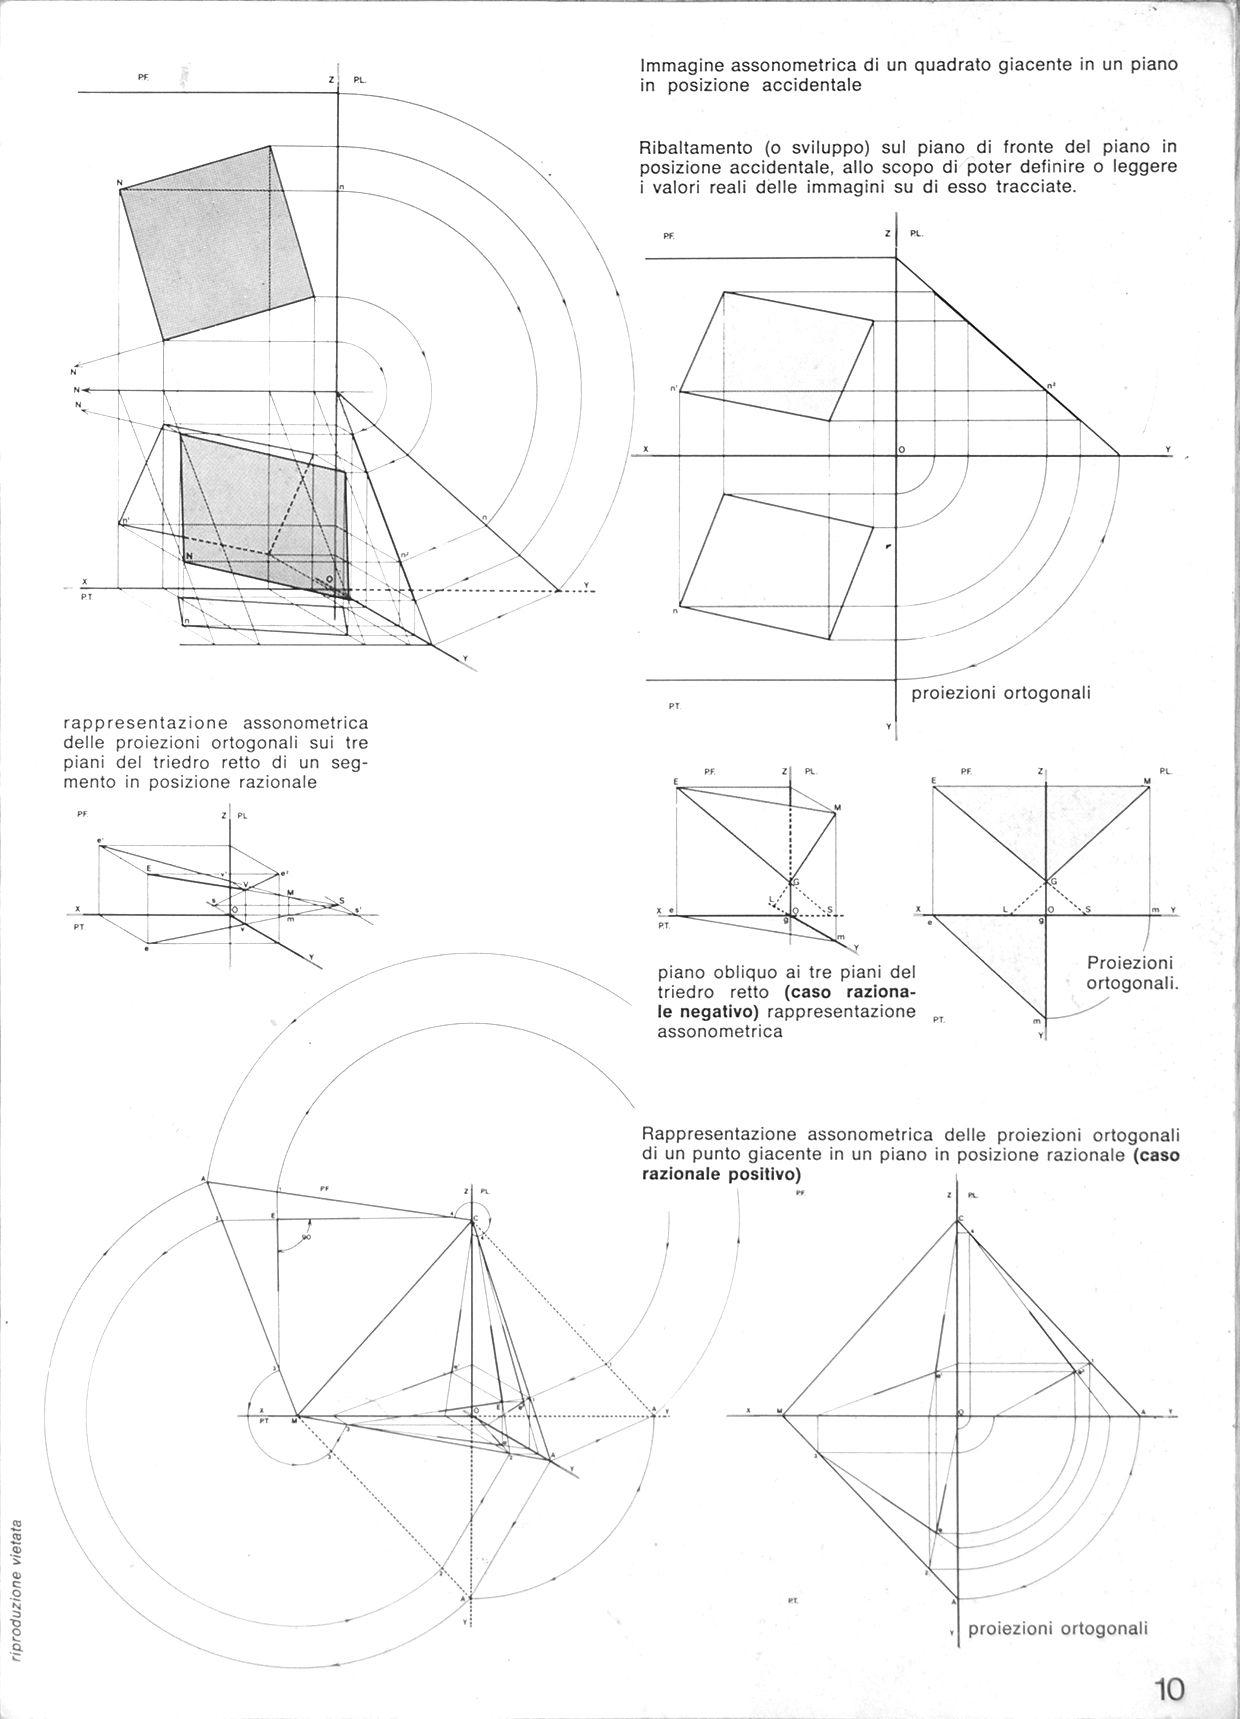 Pin By Trini Cherry On Everything Geometric